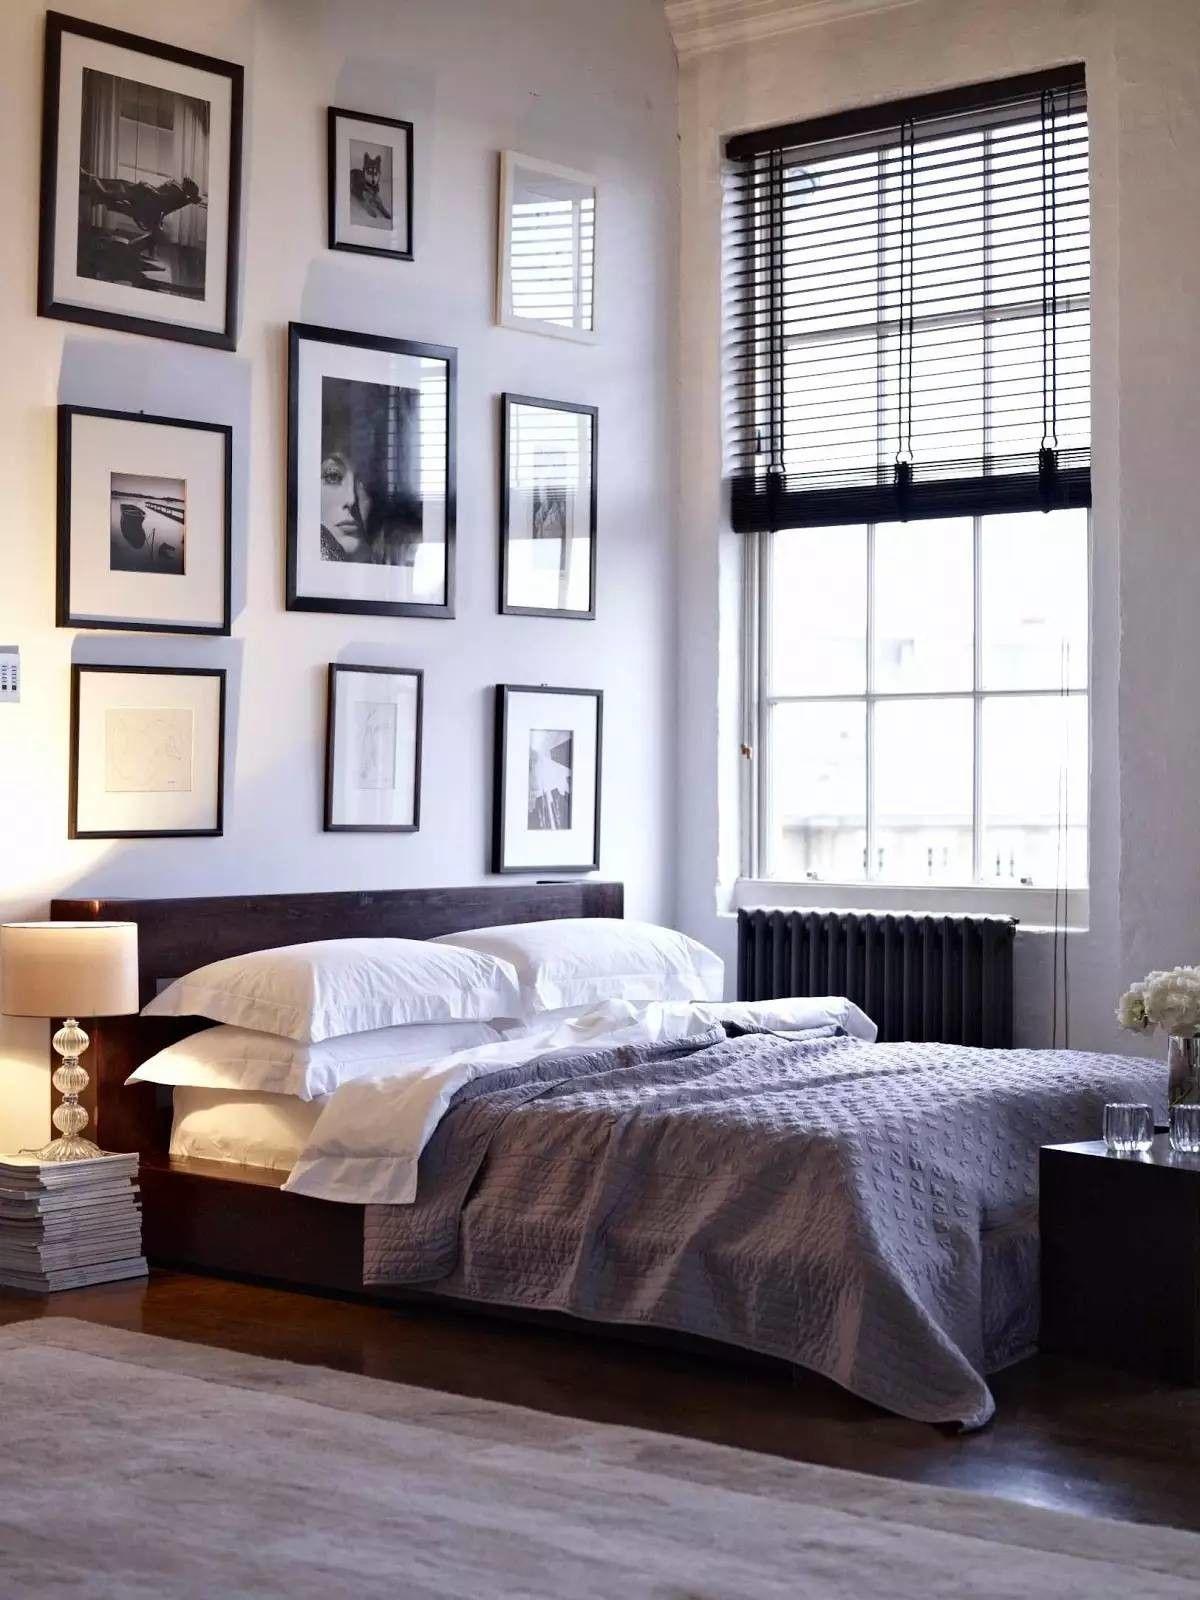 Pin by emma peepsocks on bedrooms pinterest bedrooms